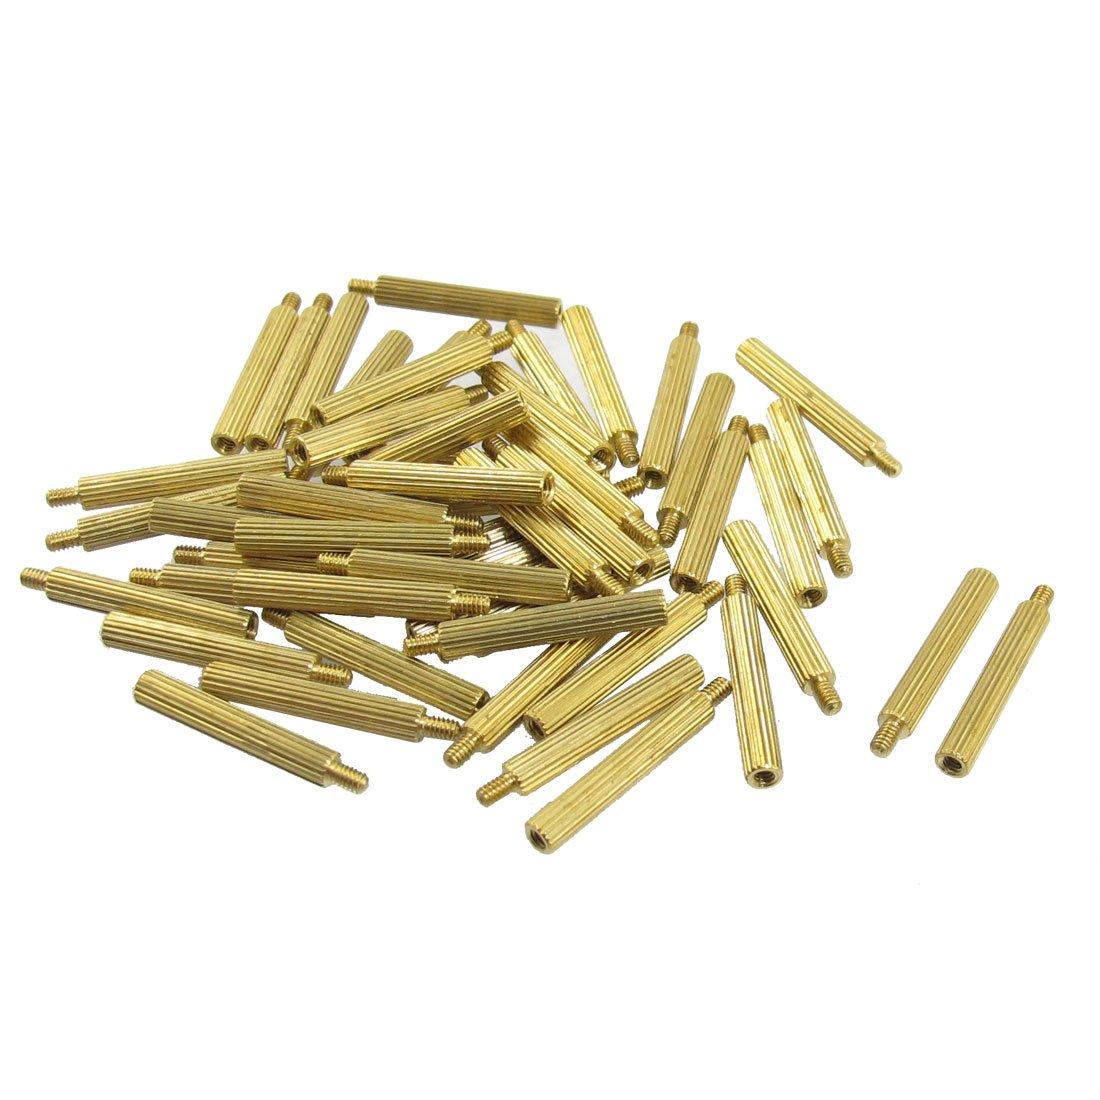 50 pezzi oro maschio esagonale femmina PCB angoli distanziatori M 2 x 19 mmx22mm sourcing map a13010800ux0383